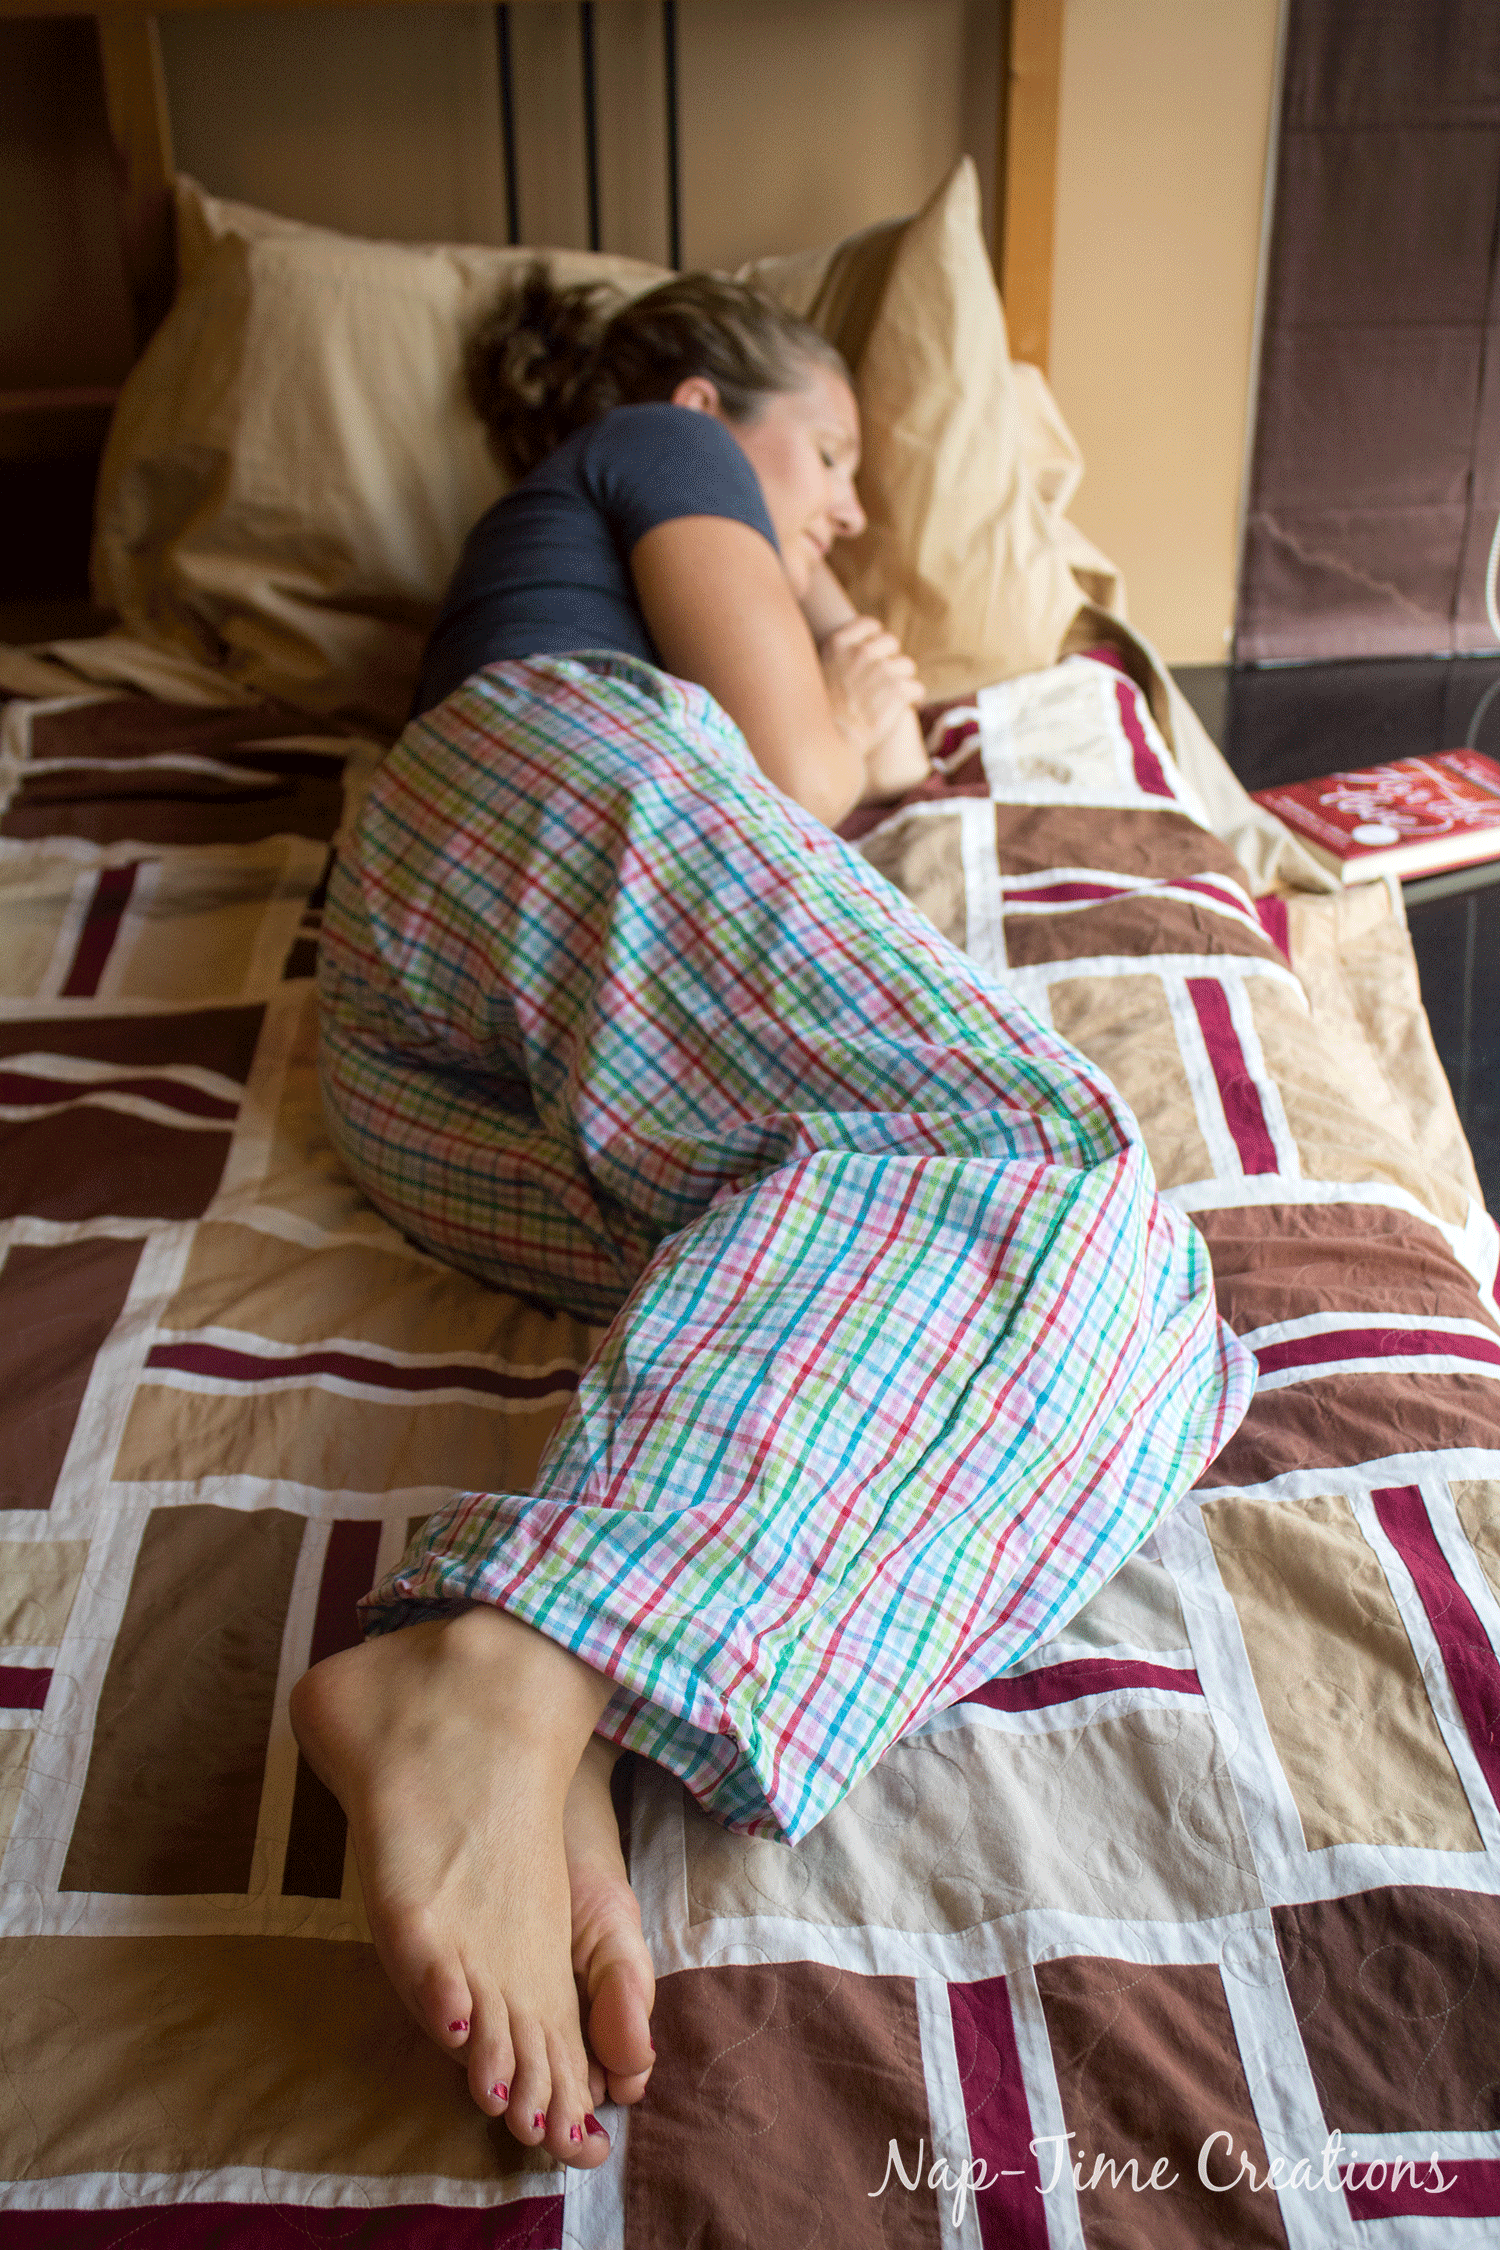 pj-lounge-pants-free-pattern-xxs-xxl-from-nap-time-creations